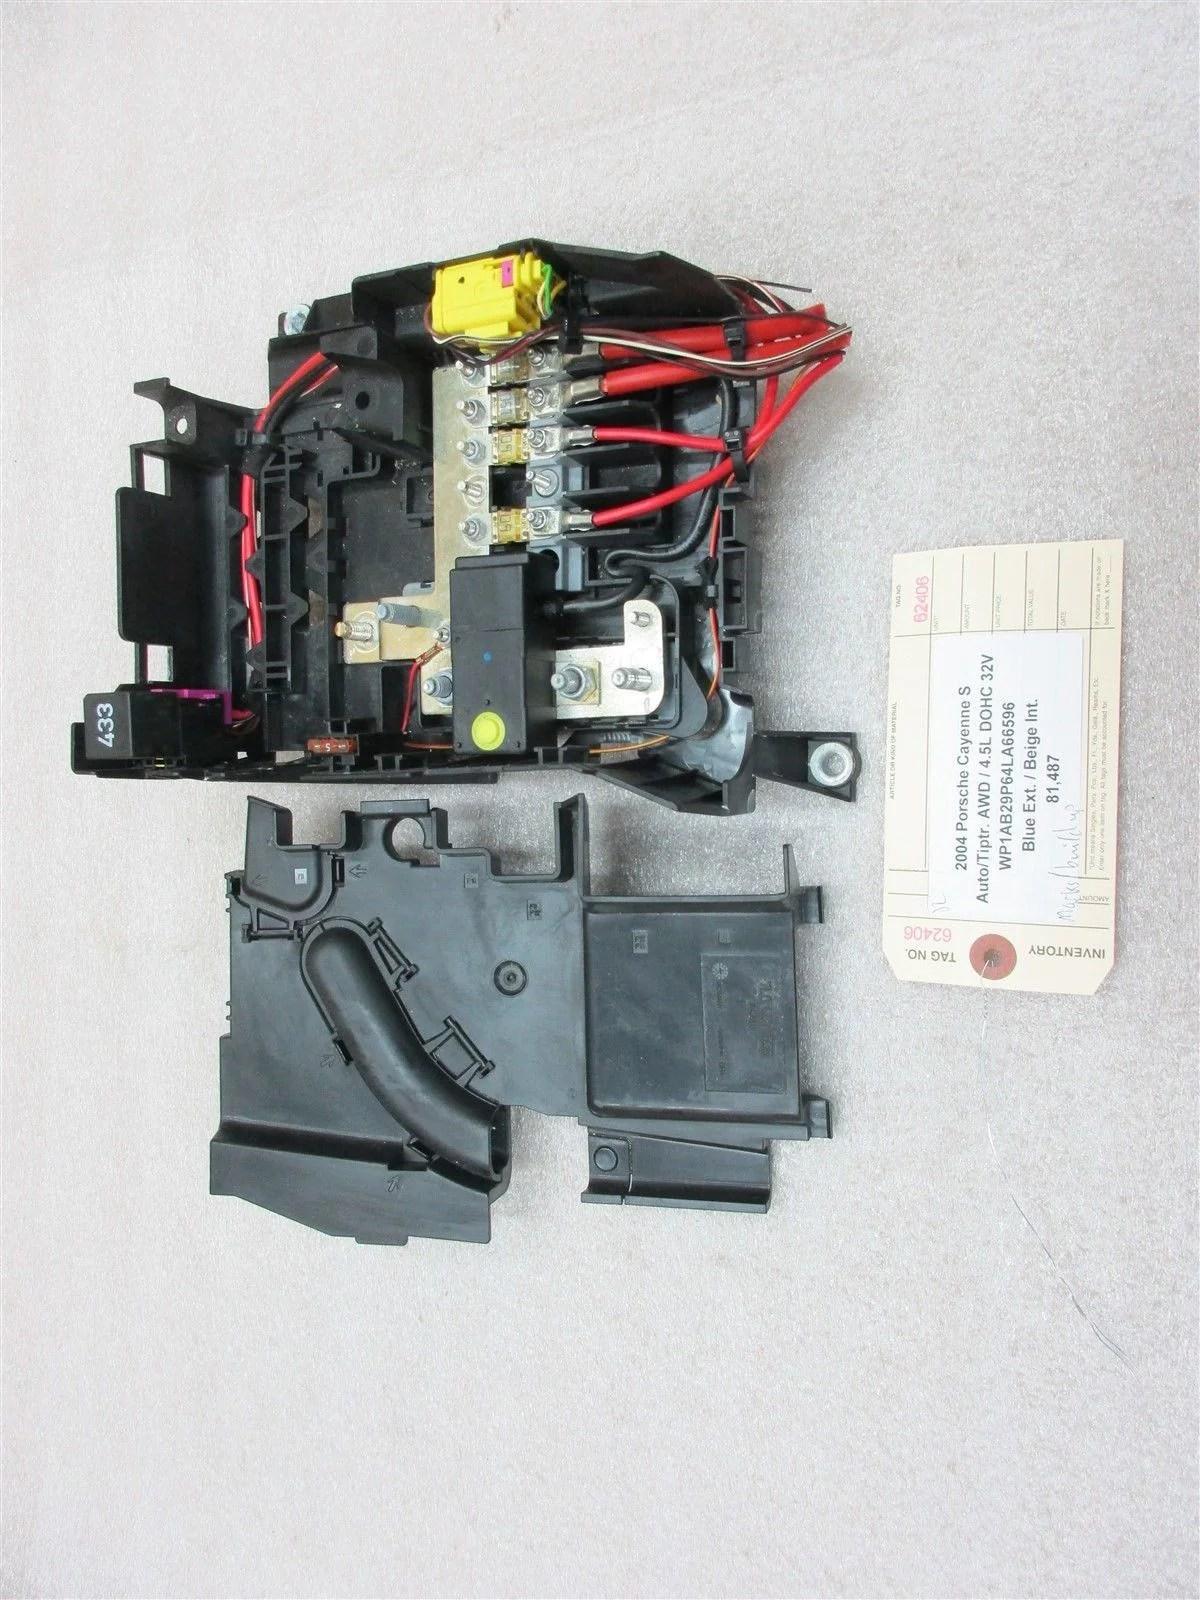 hight resolution of 04 cayenne s awd porsche 955 fuse box relay 7l0937548a 7l0937555 8104 cayenne s awd porsche